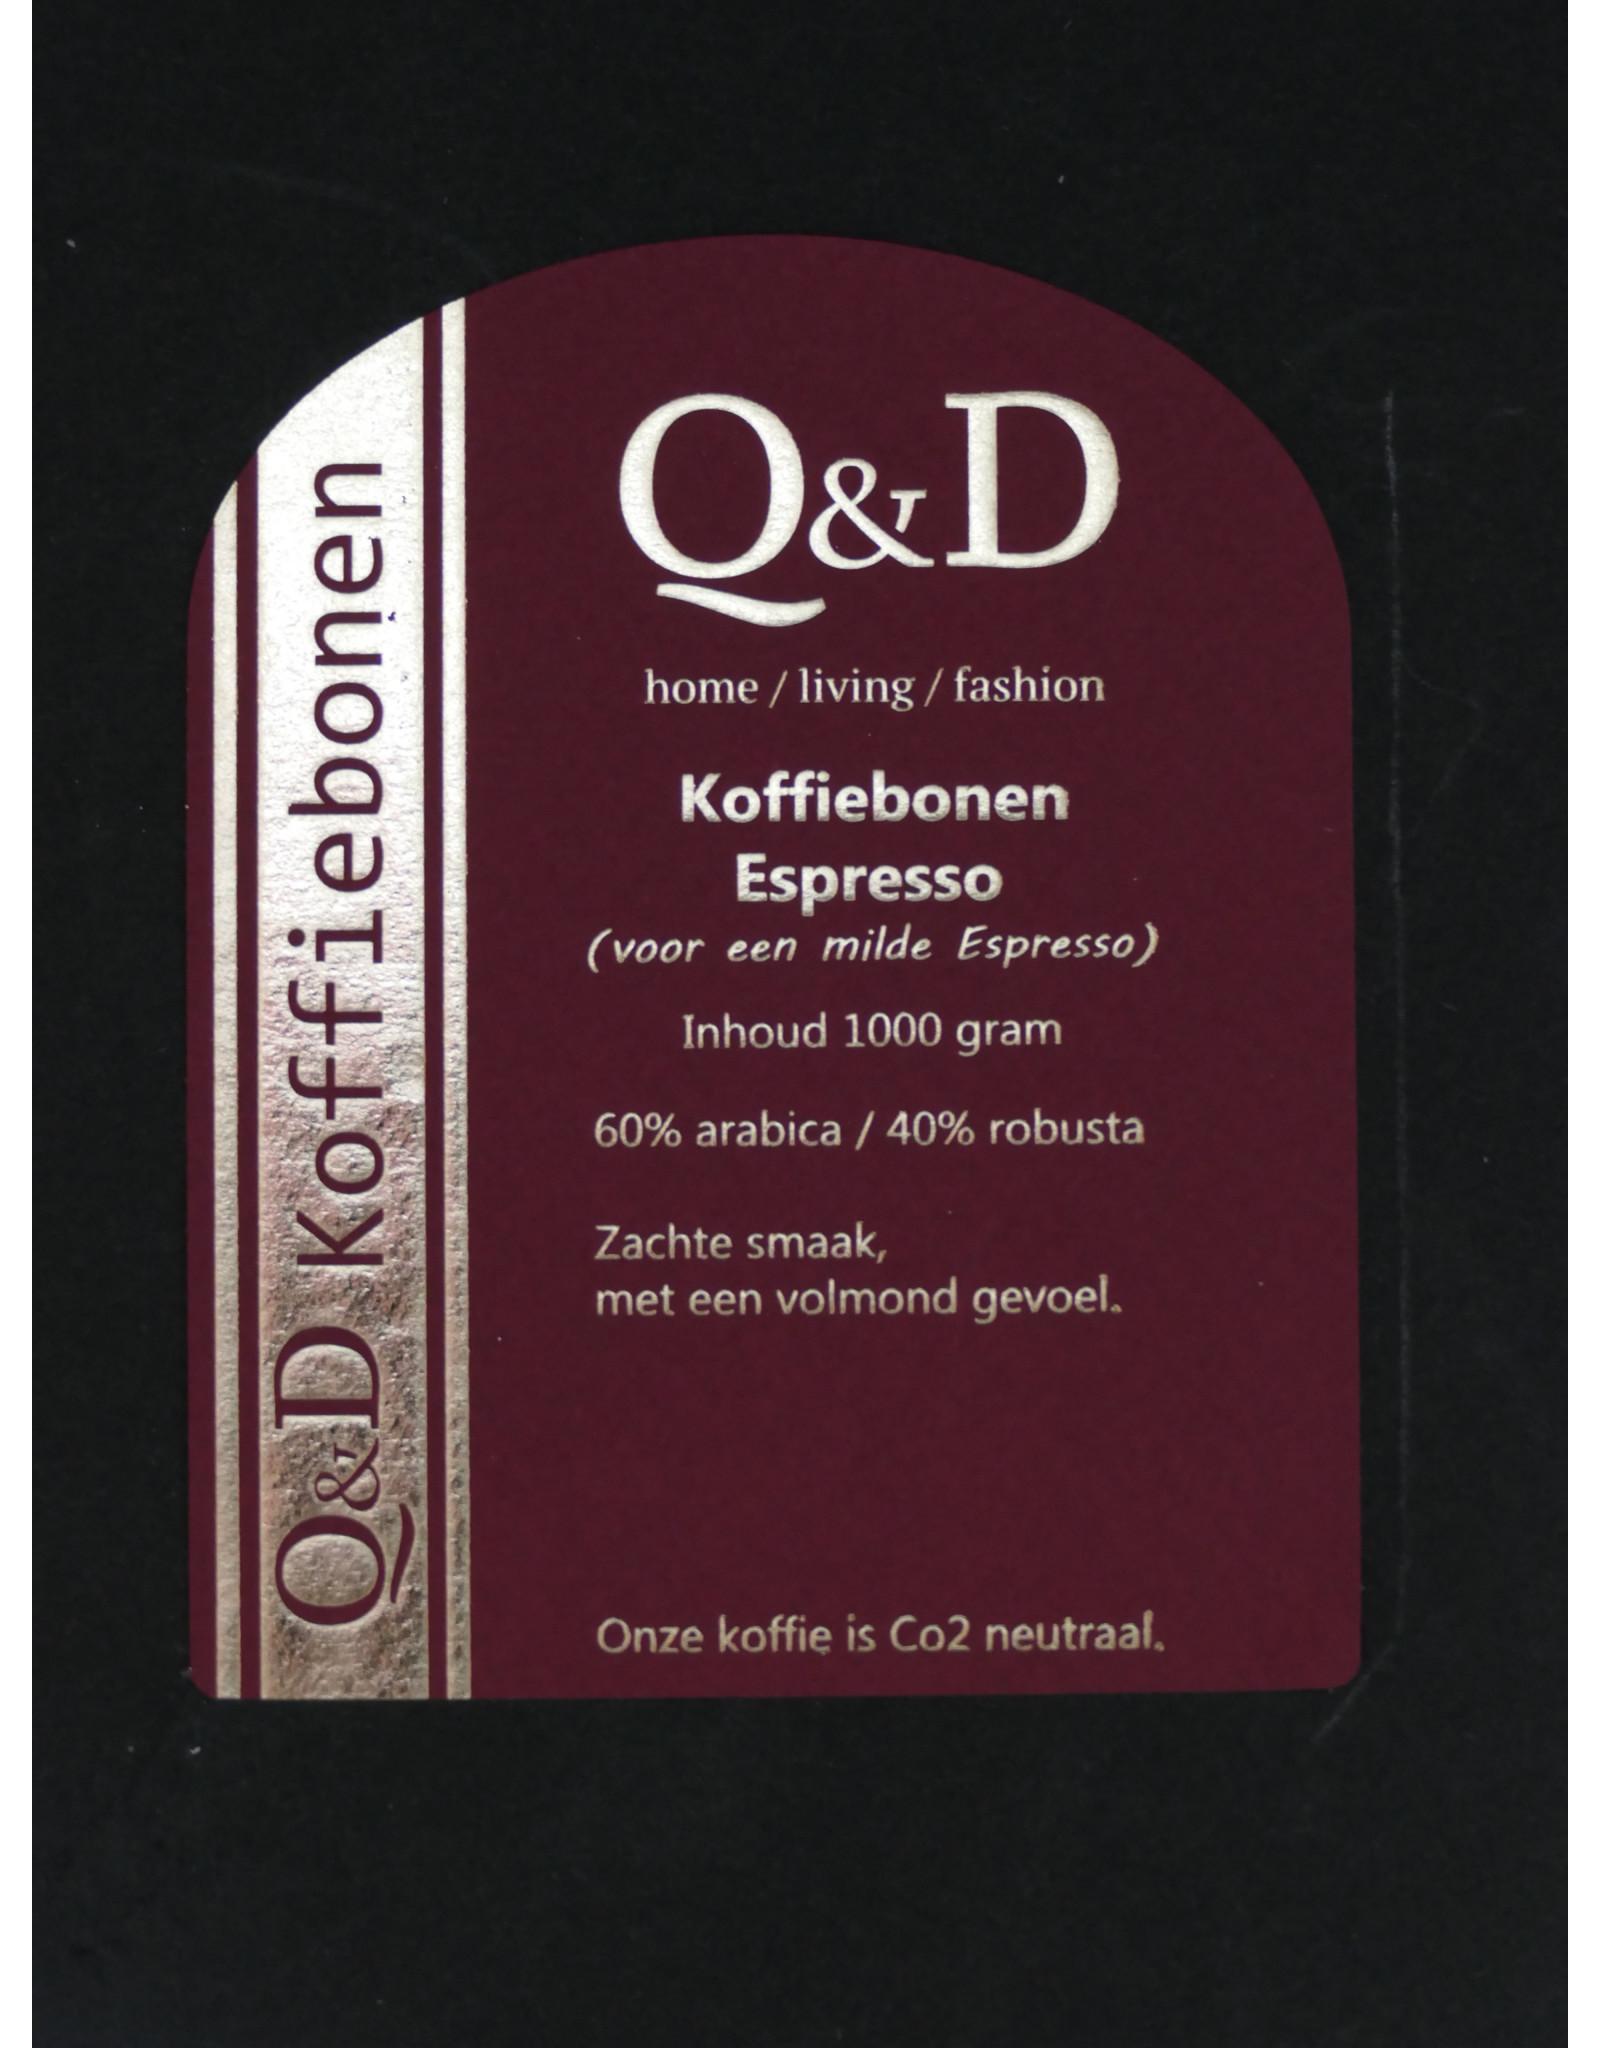 Q&D KOFFIEBONEN KOFFIEBONEN ESPRESSO 1KG ROOD